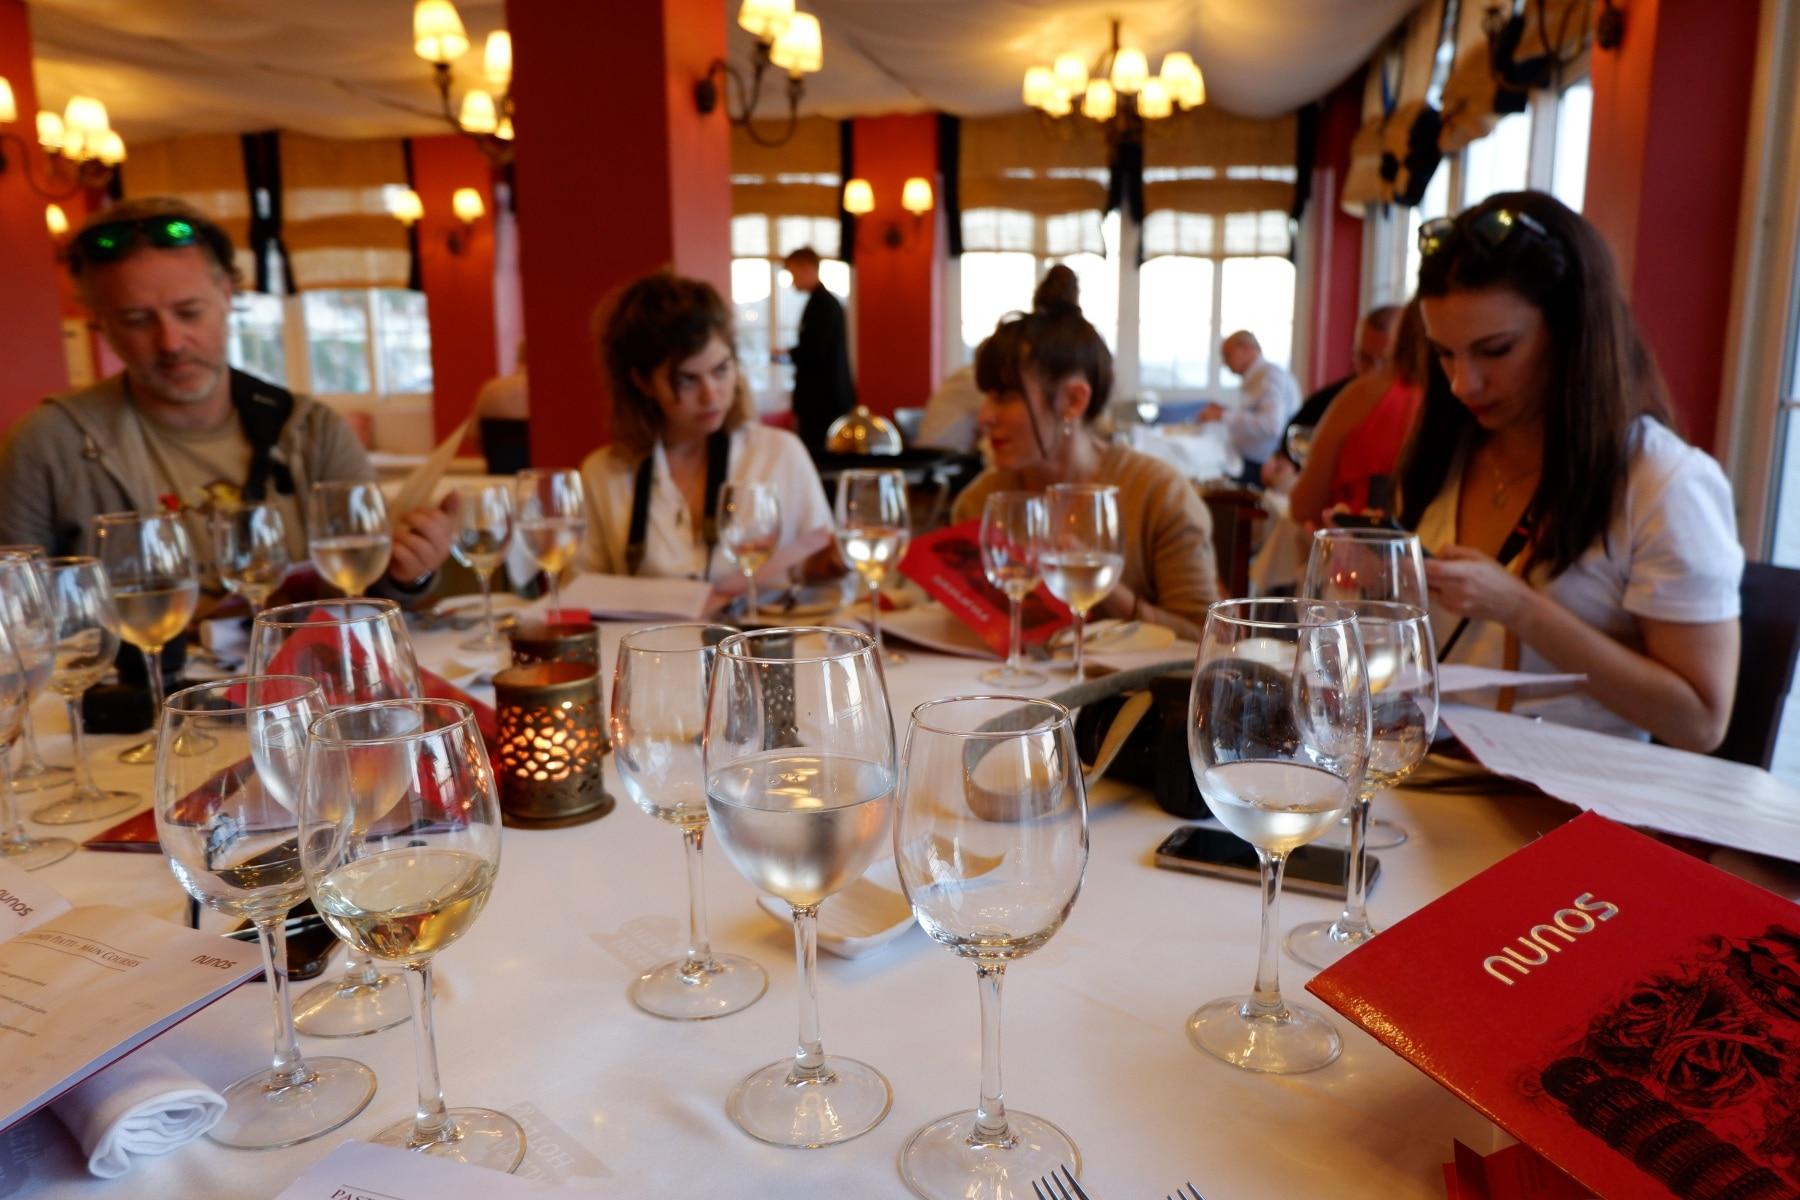 23-jun-2019-blogueros-espaoles-de-viajes-visitan-el-pen_48131074511_o